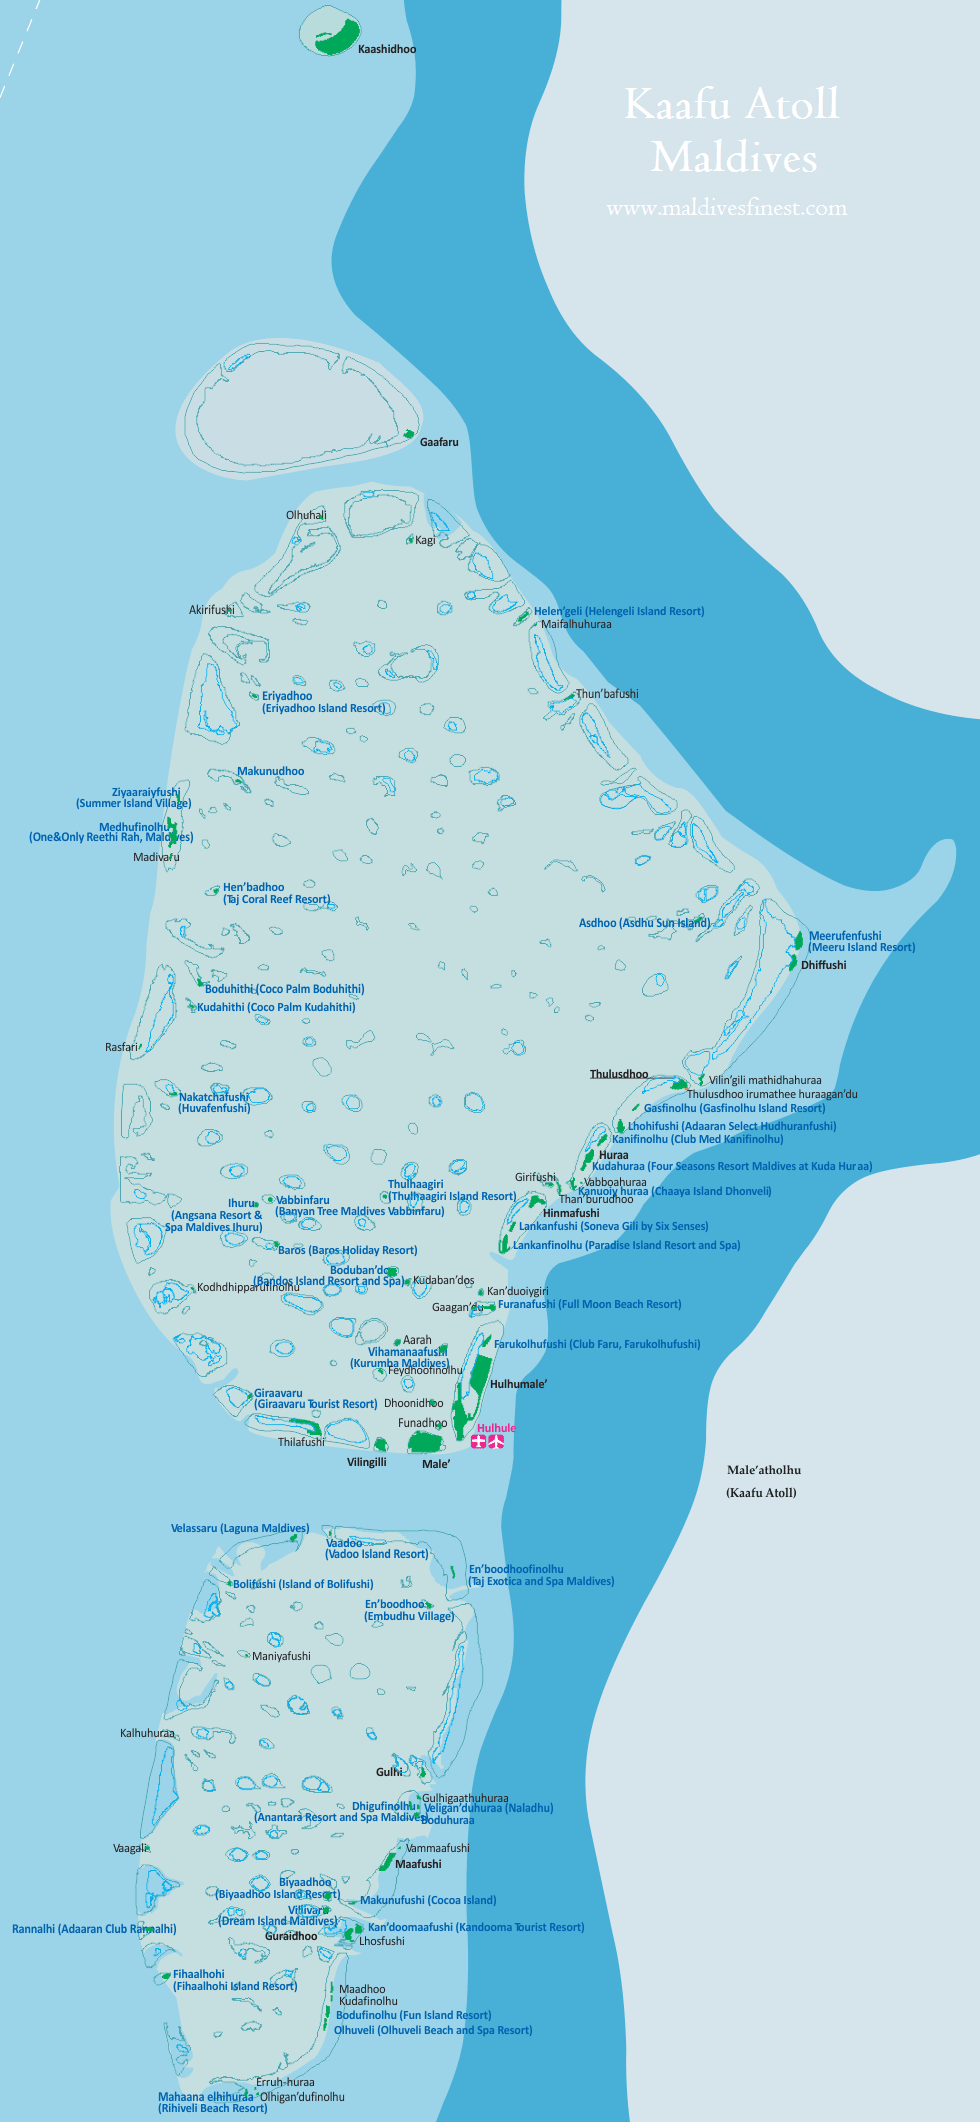 Maldives Map With Resorts Airports and Local Islands Maldives